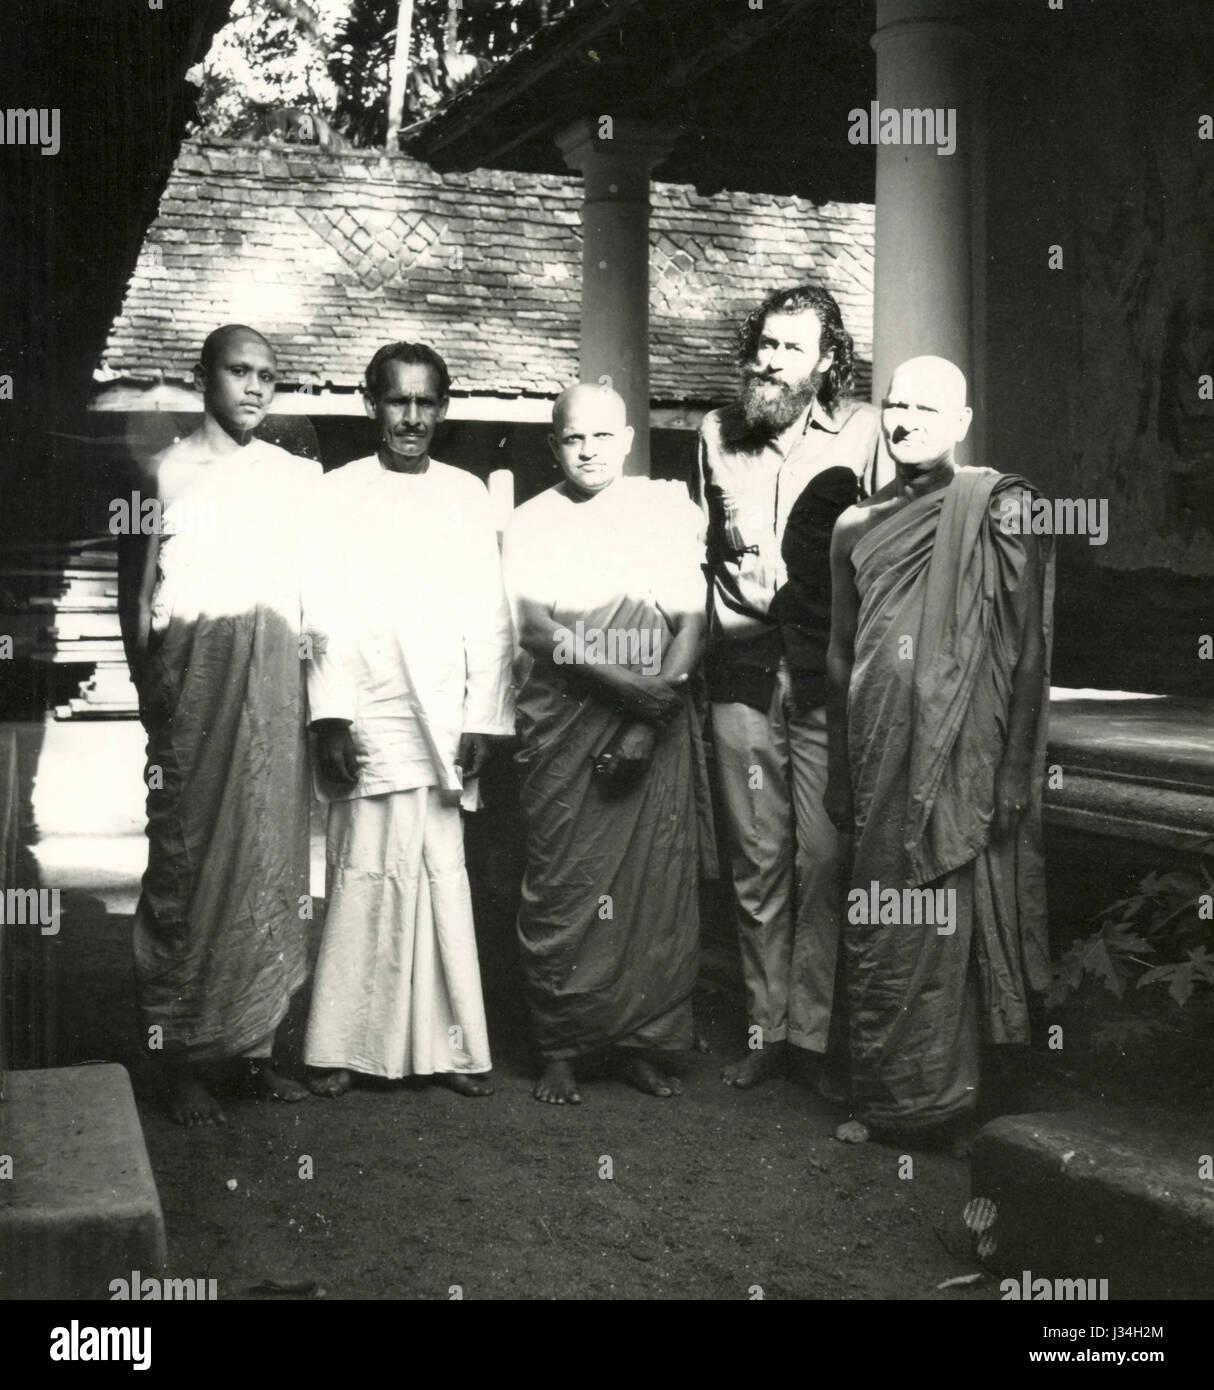 Group photo with the guru, India - Stock Image